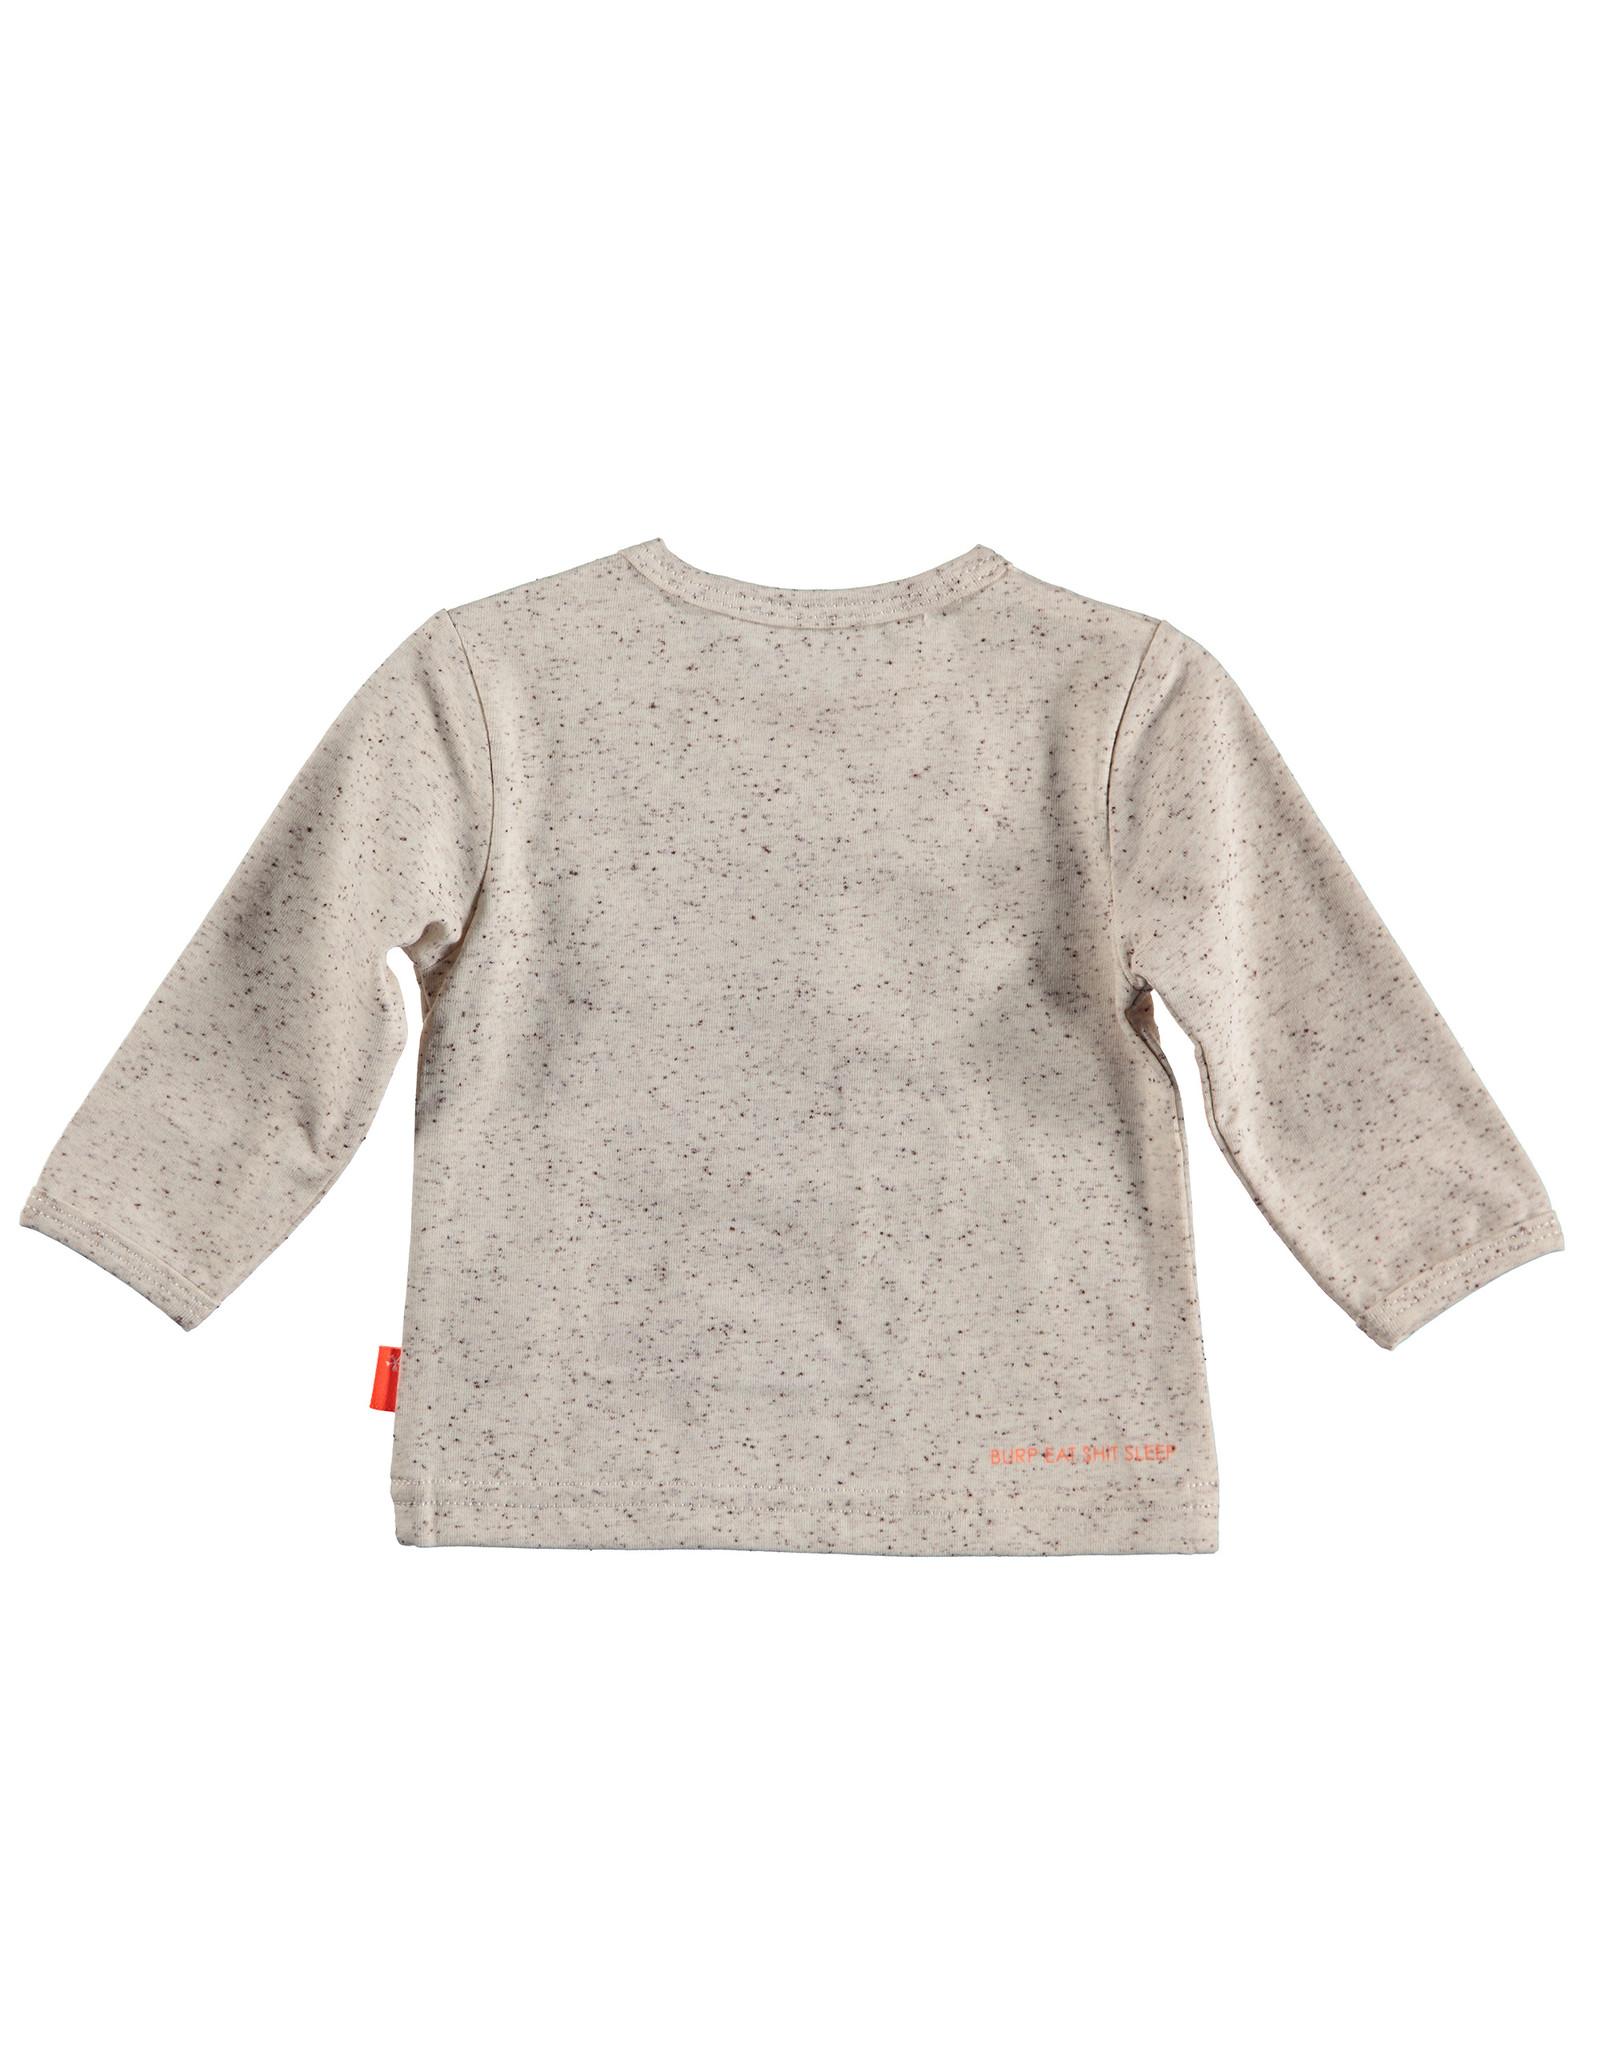 B.E.S.S. Shirt l.sl. Penguin, Sand